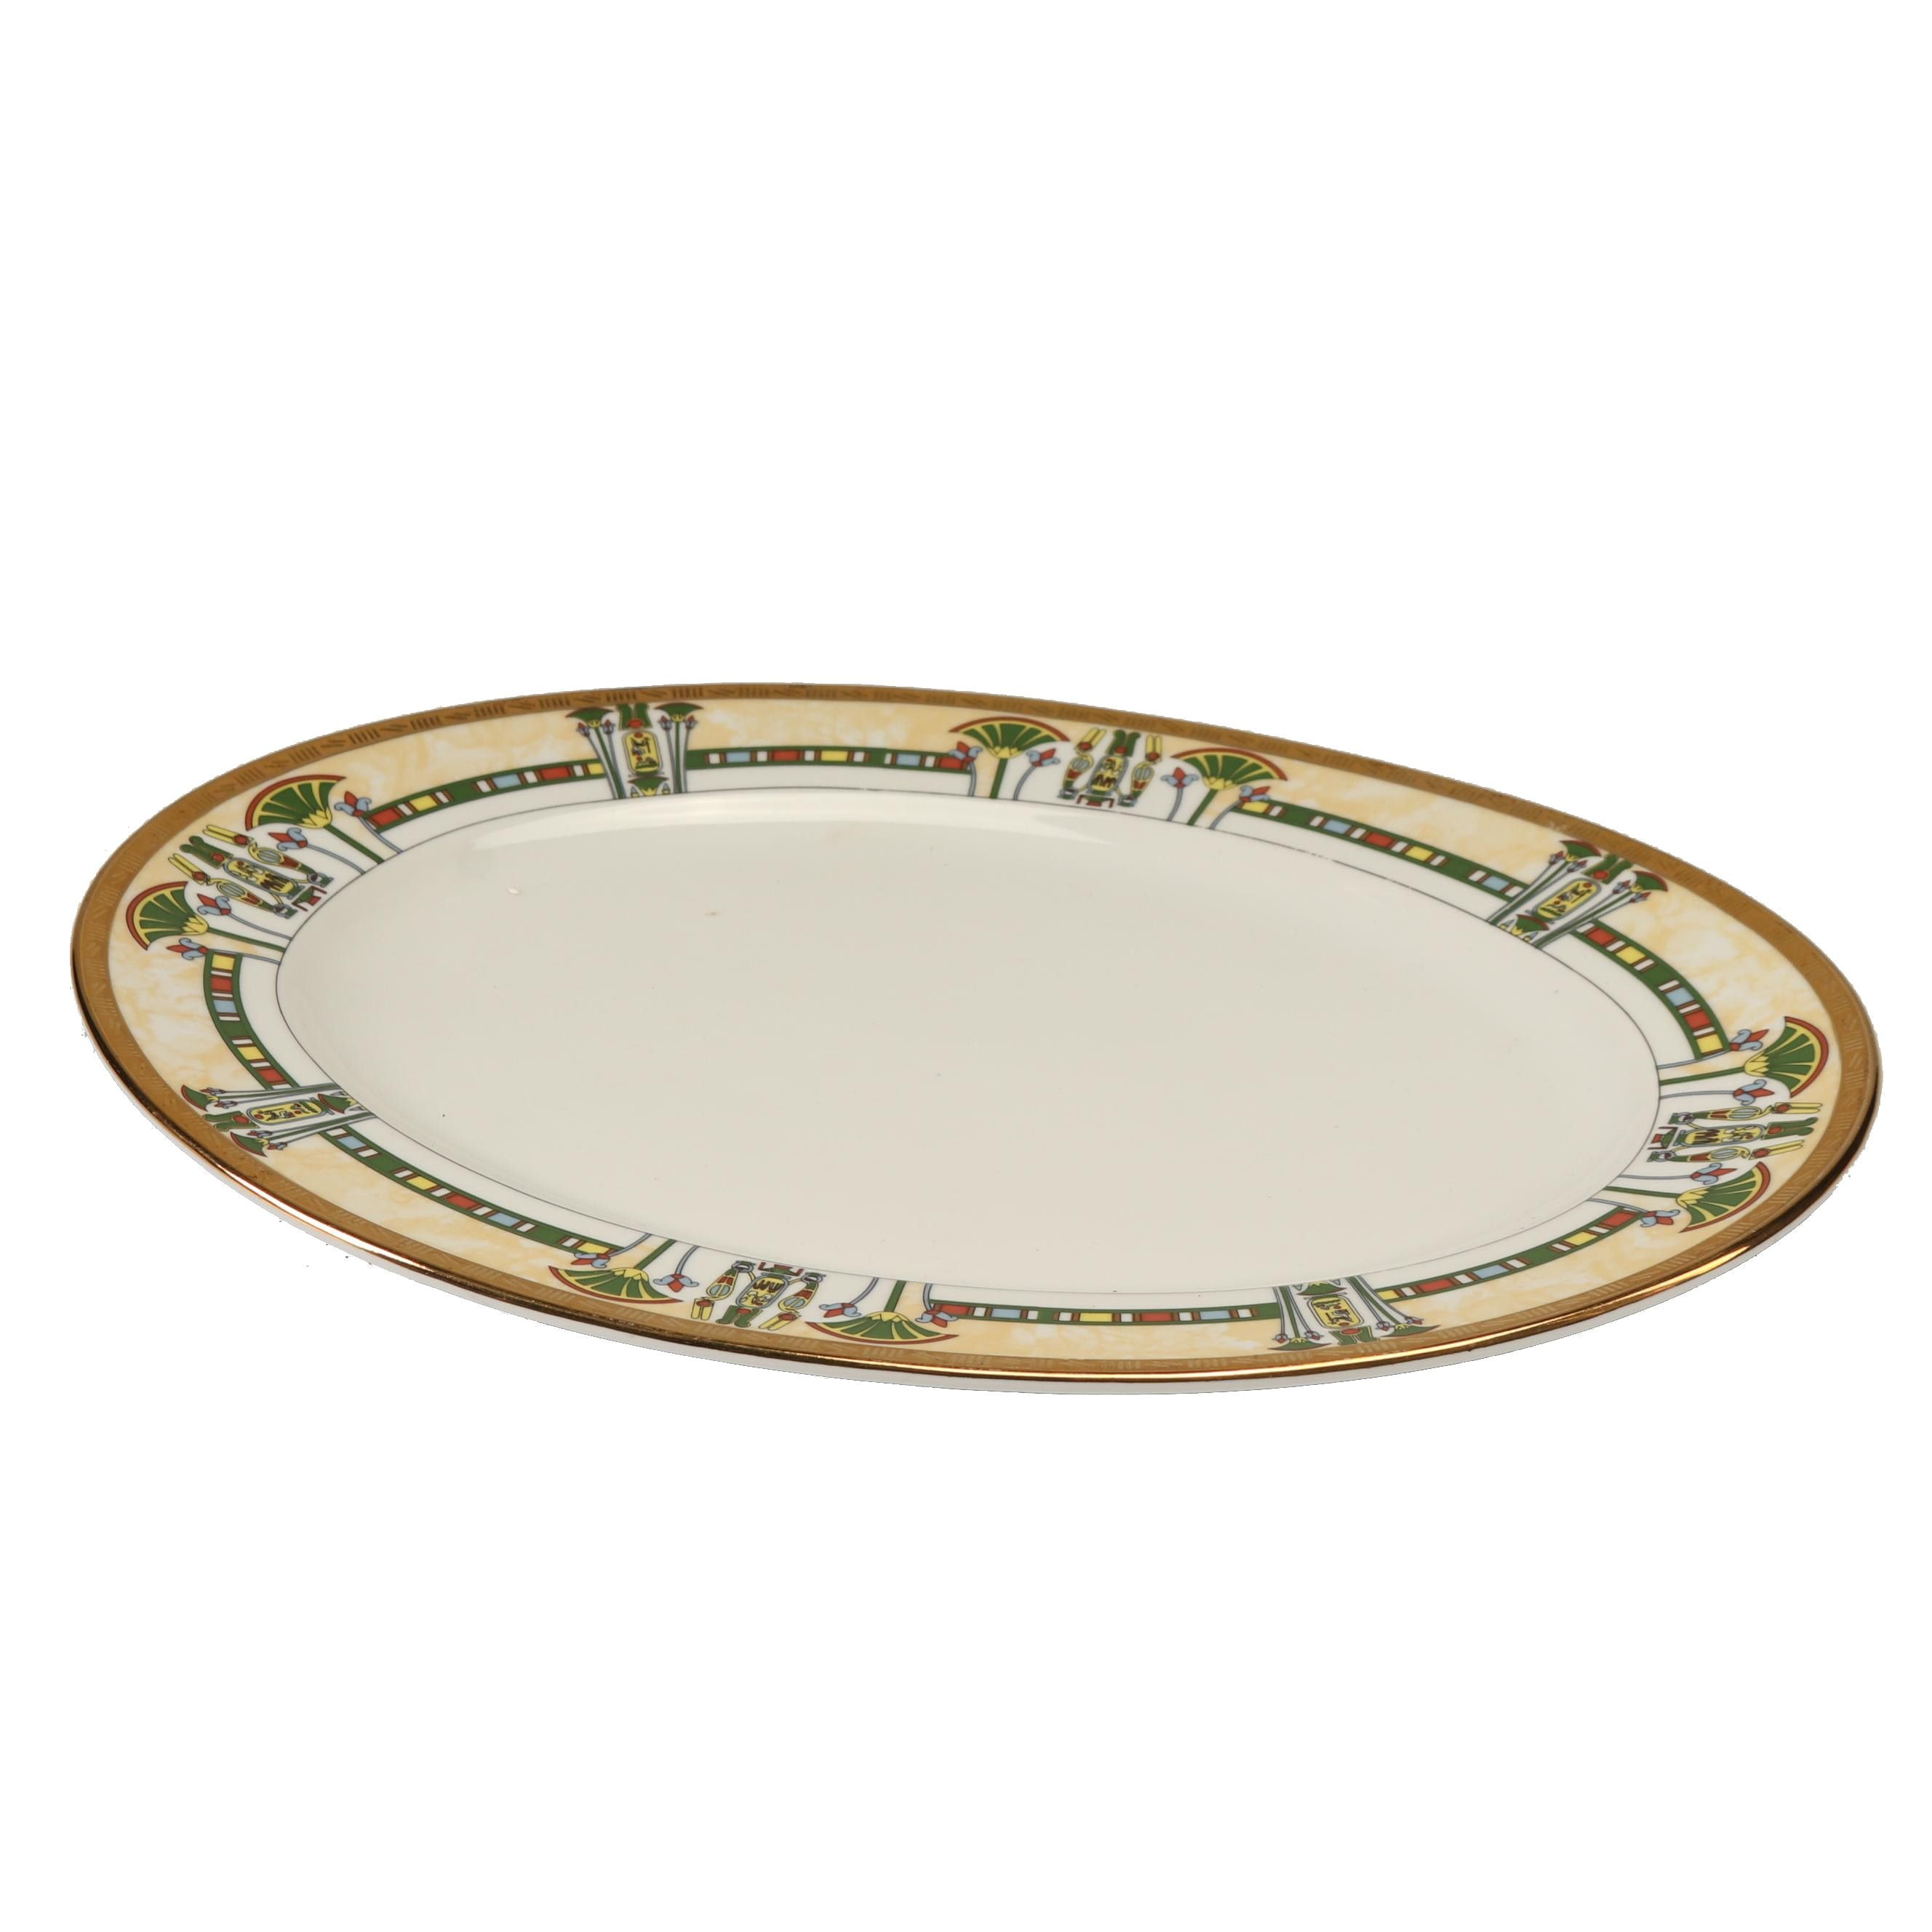 Thun Karlovarský  Porcelain Oval Platter